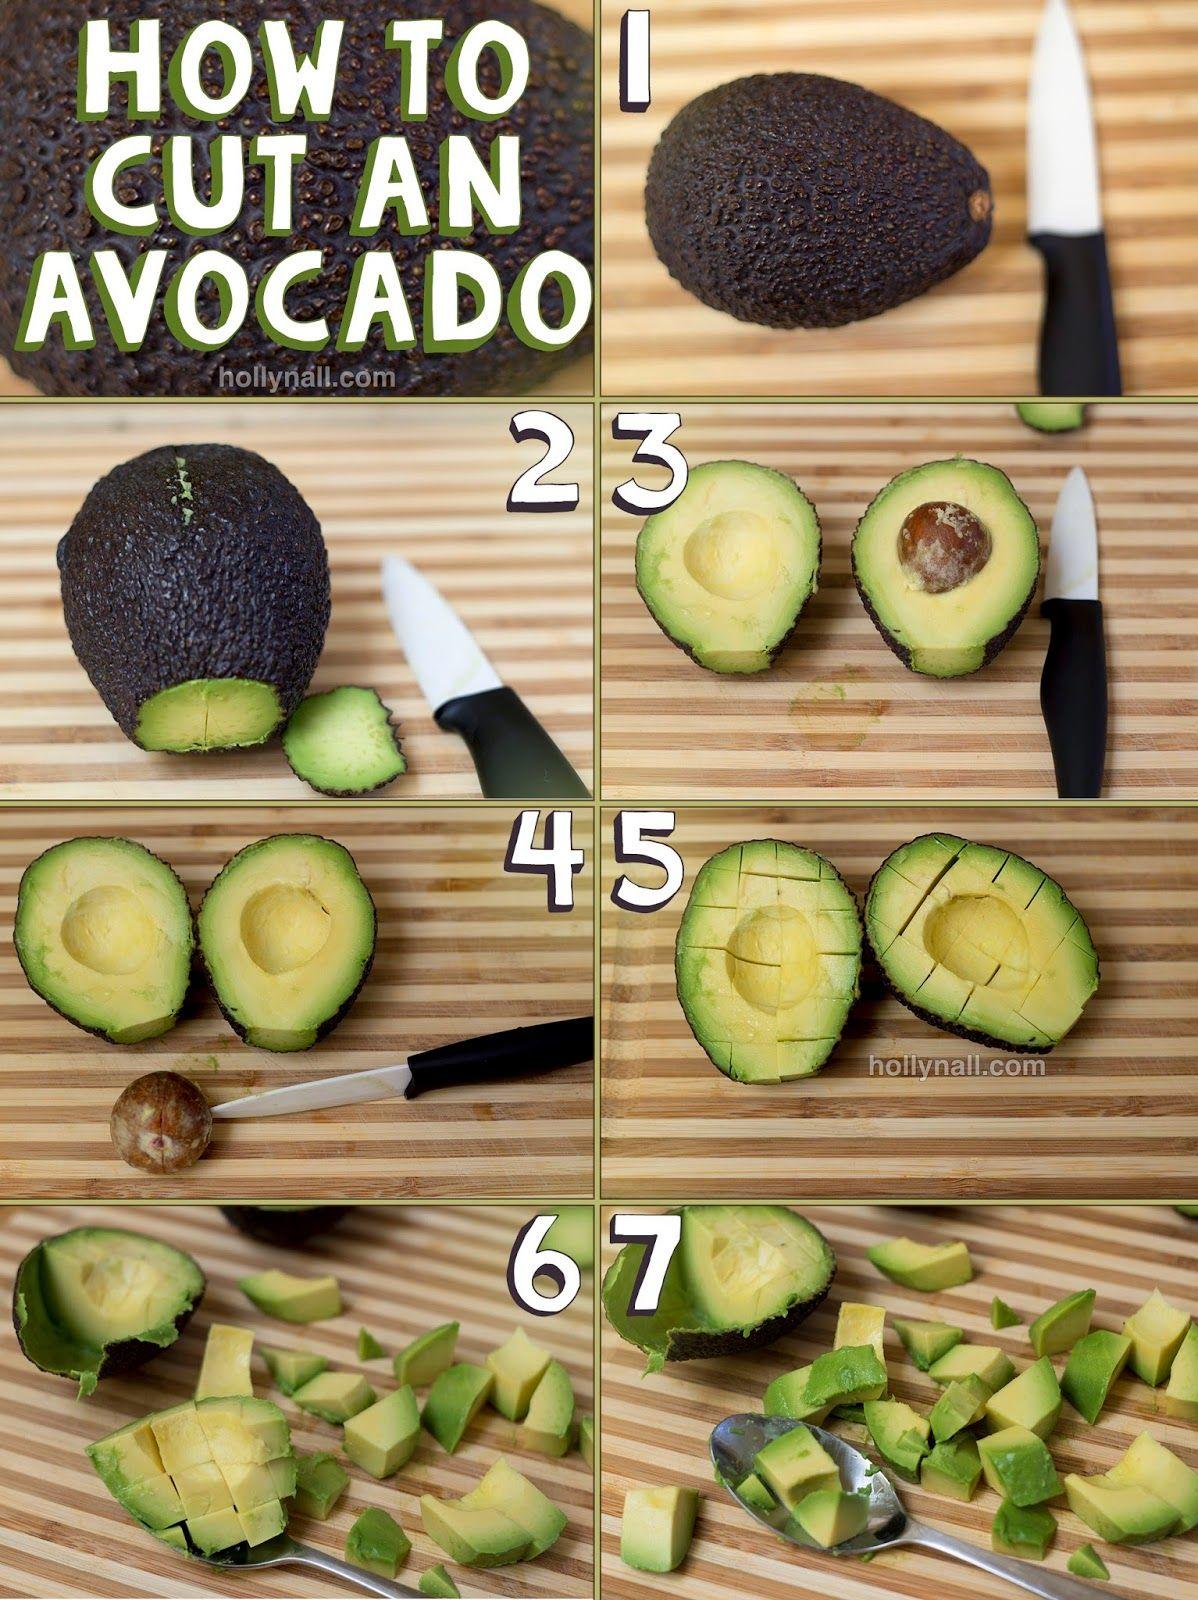 Watch How to Cut an Avocado video